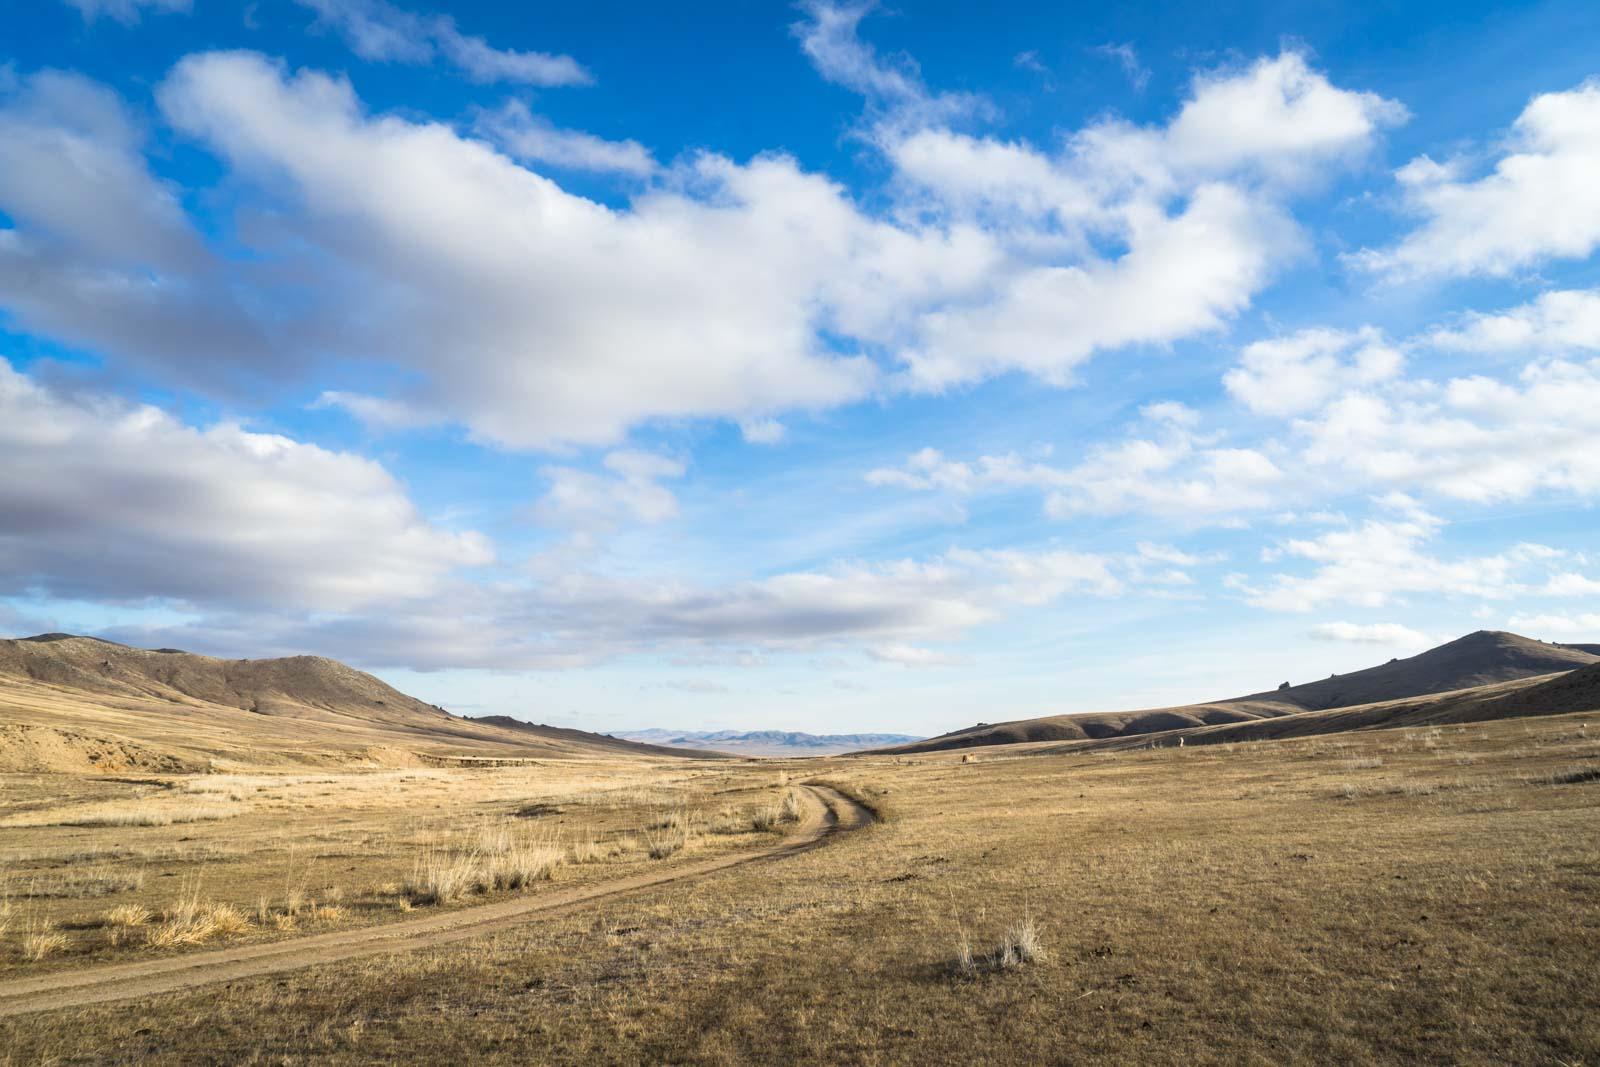 Przewalksi's Horses, Hustai National Park, Mongolia